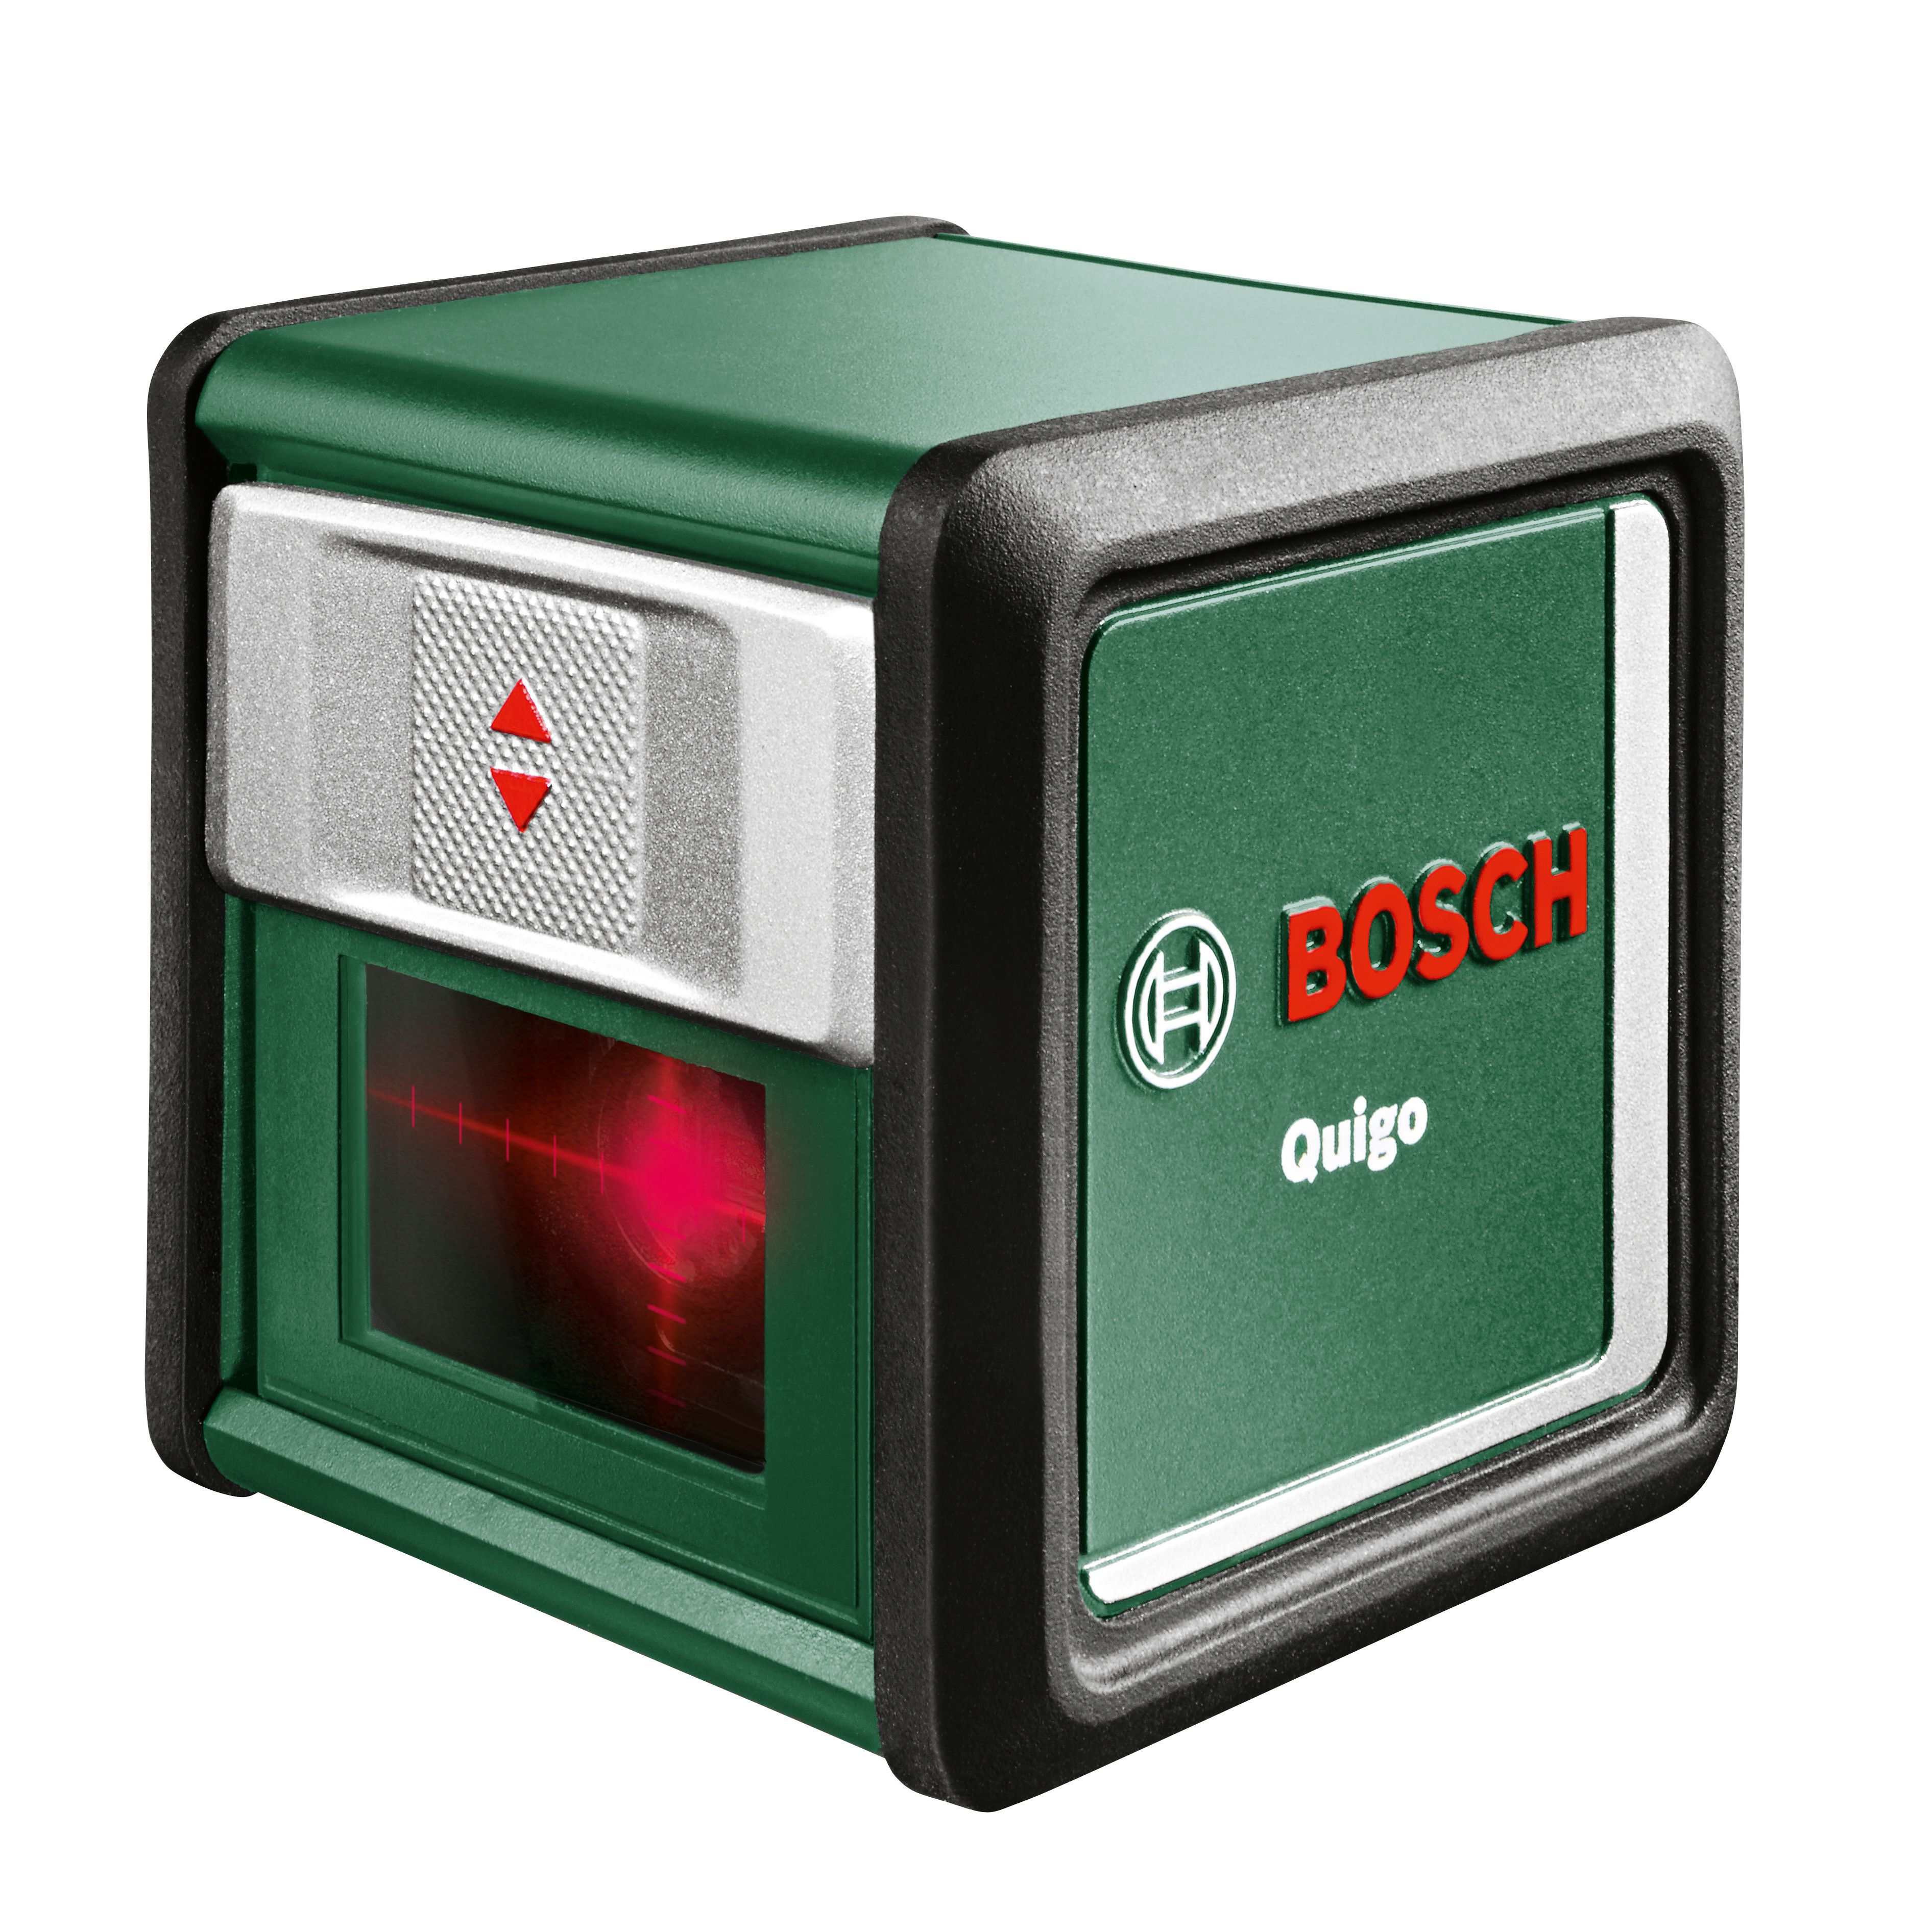 Bosch Quigo 10m Cross Line Laser Level Departments